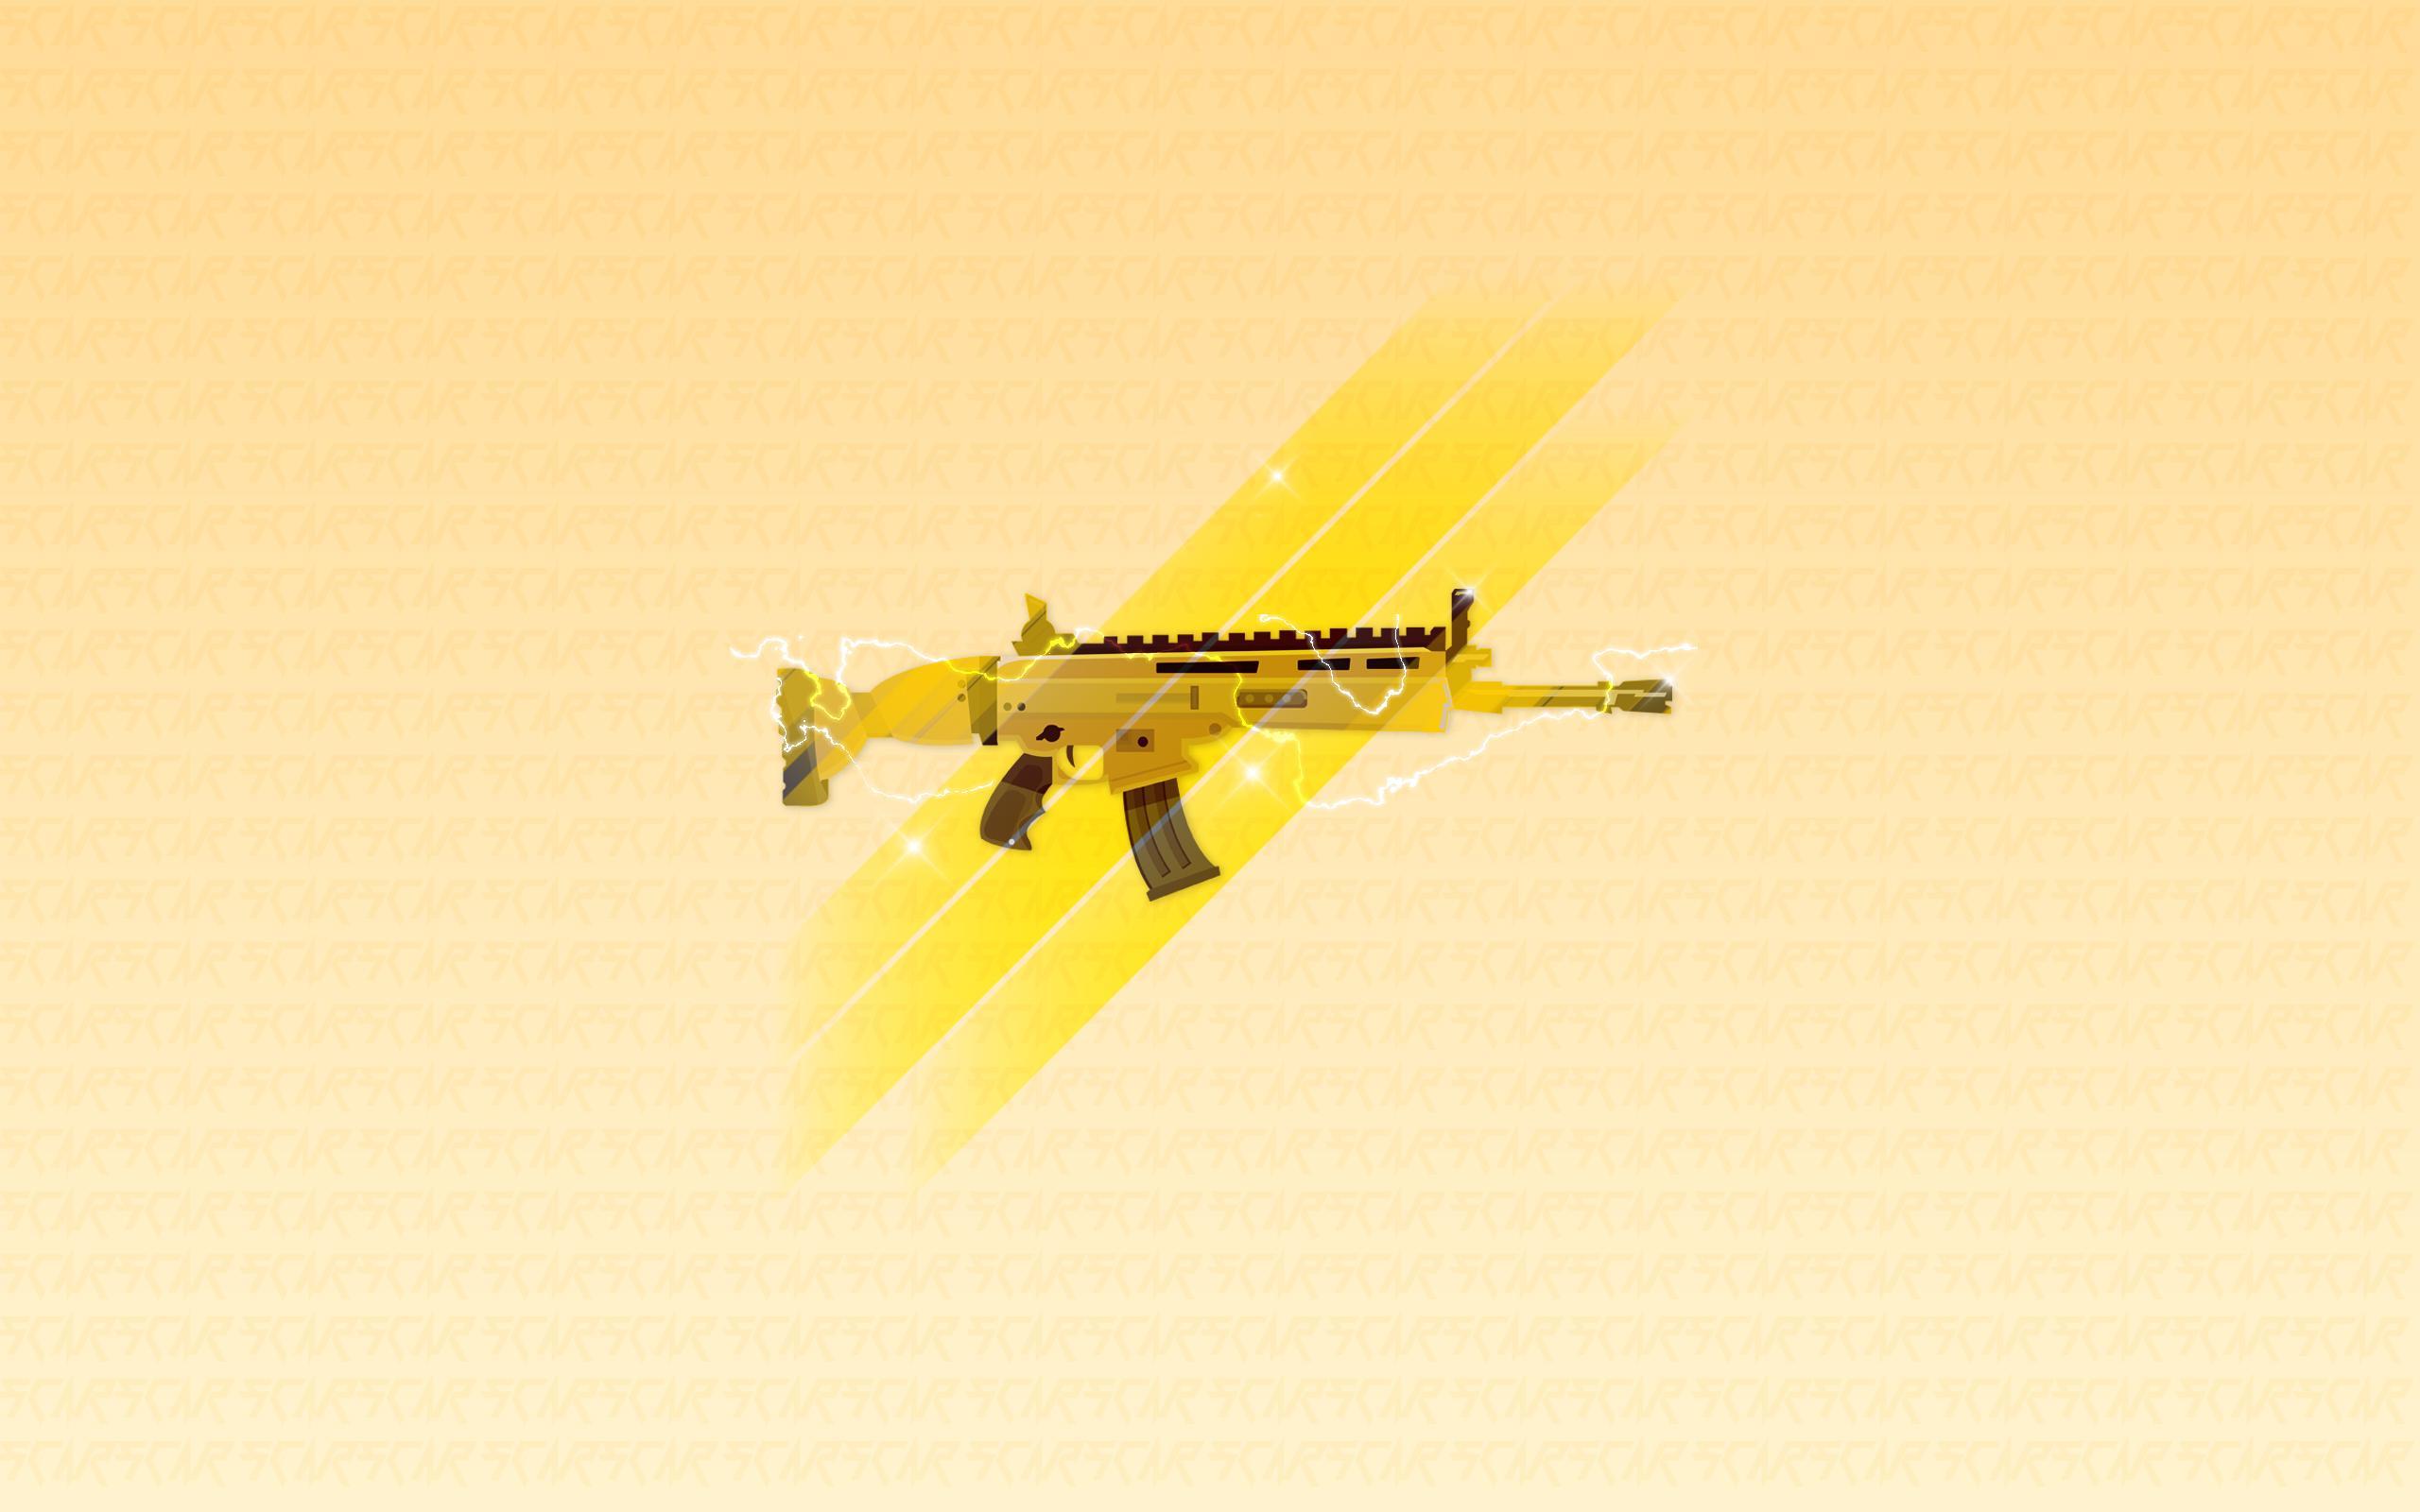 Fortnite background 8